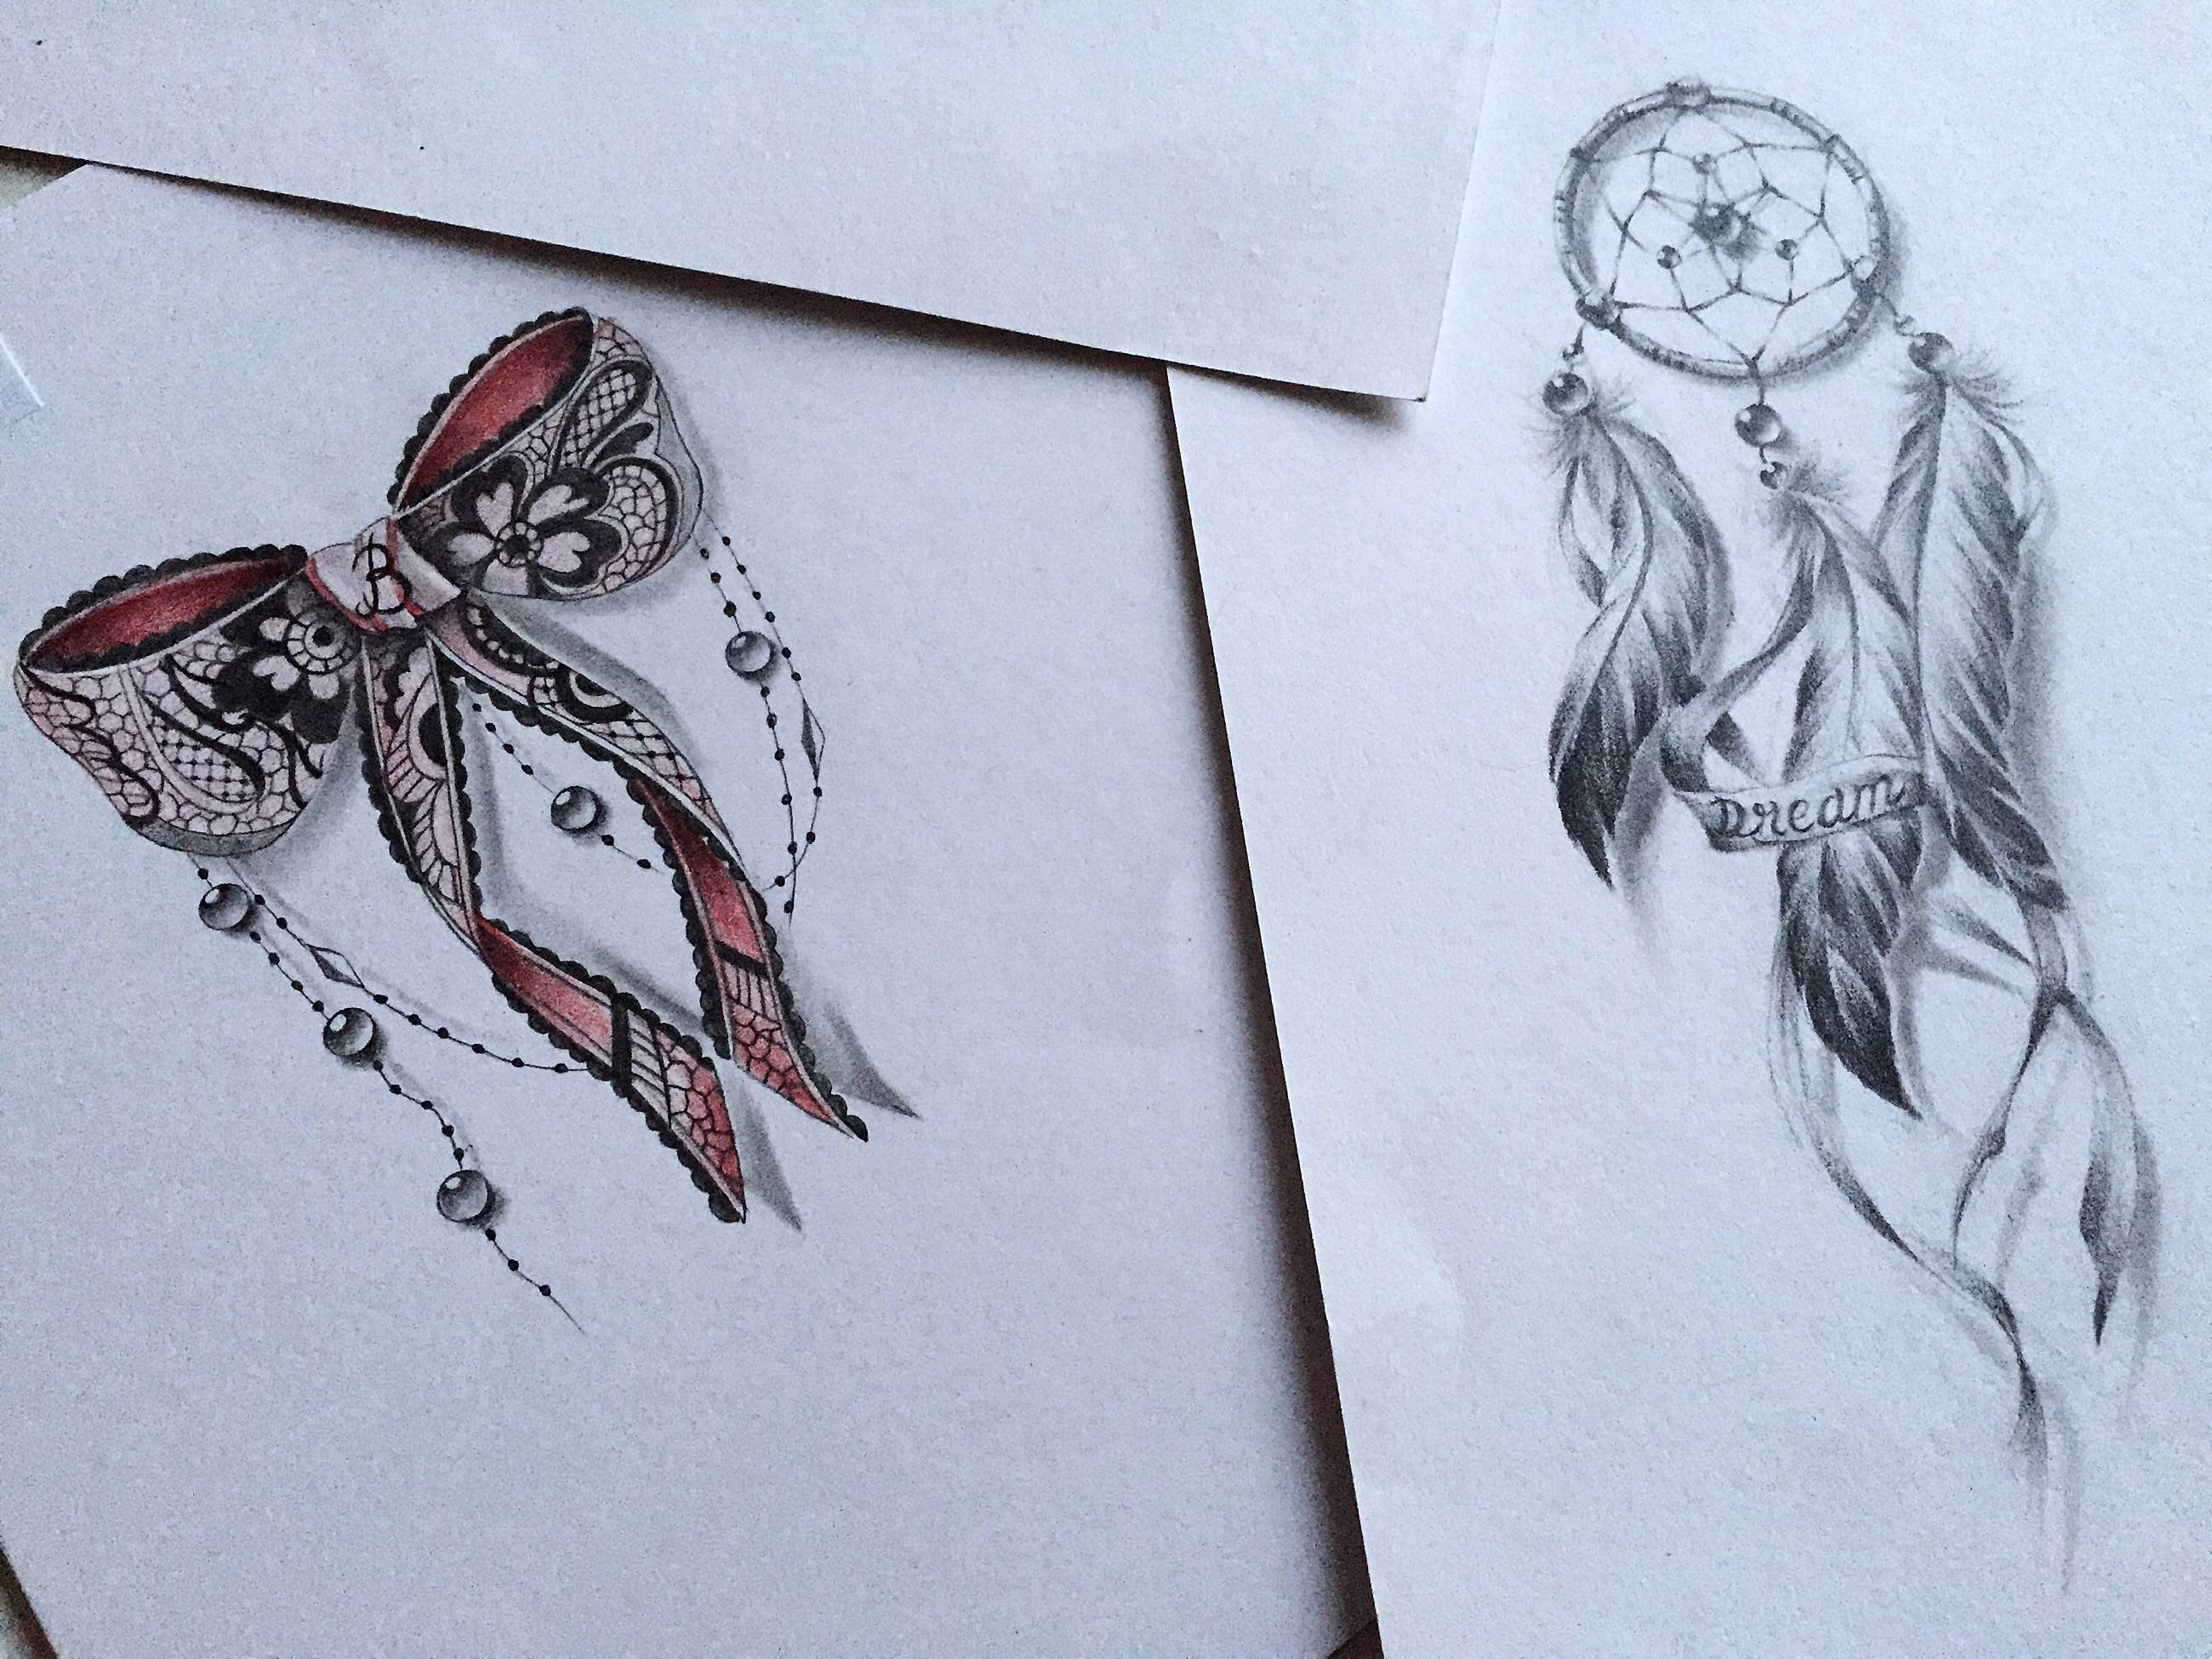 Tatouage noeud dentelle galerie tatouage - Tatouage cerf signification ...